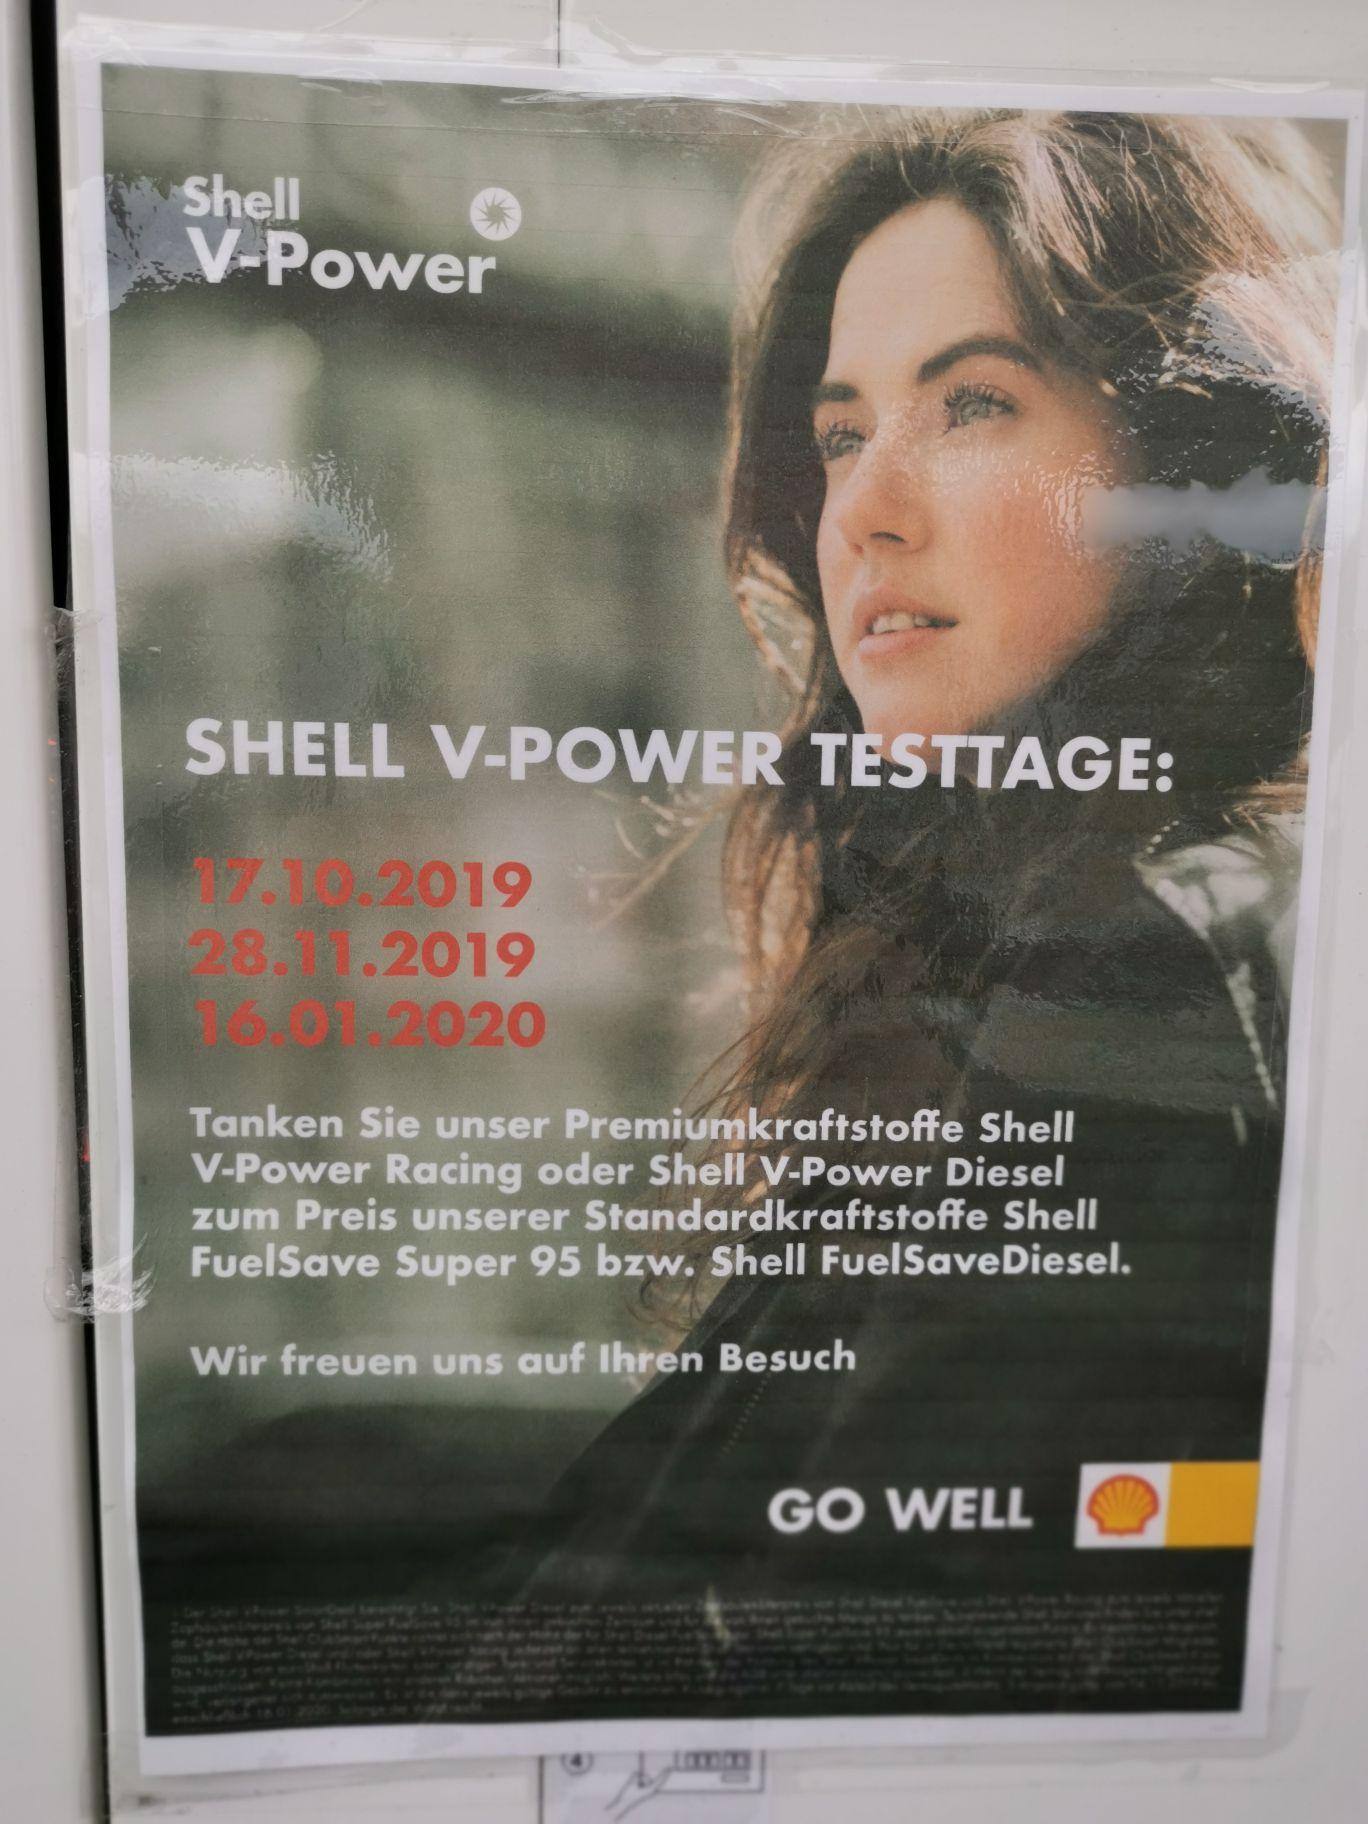 [Lokal Bundesweit?] Shell V-Power Testtage